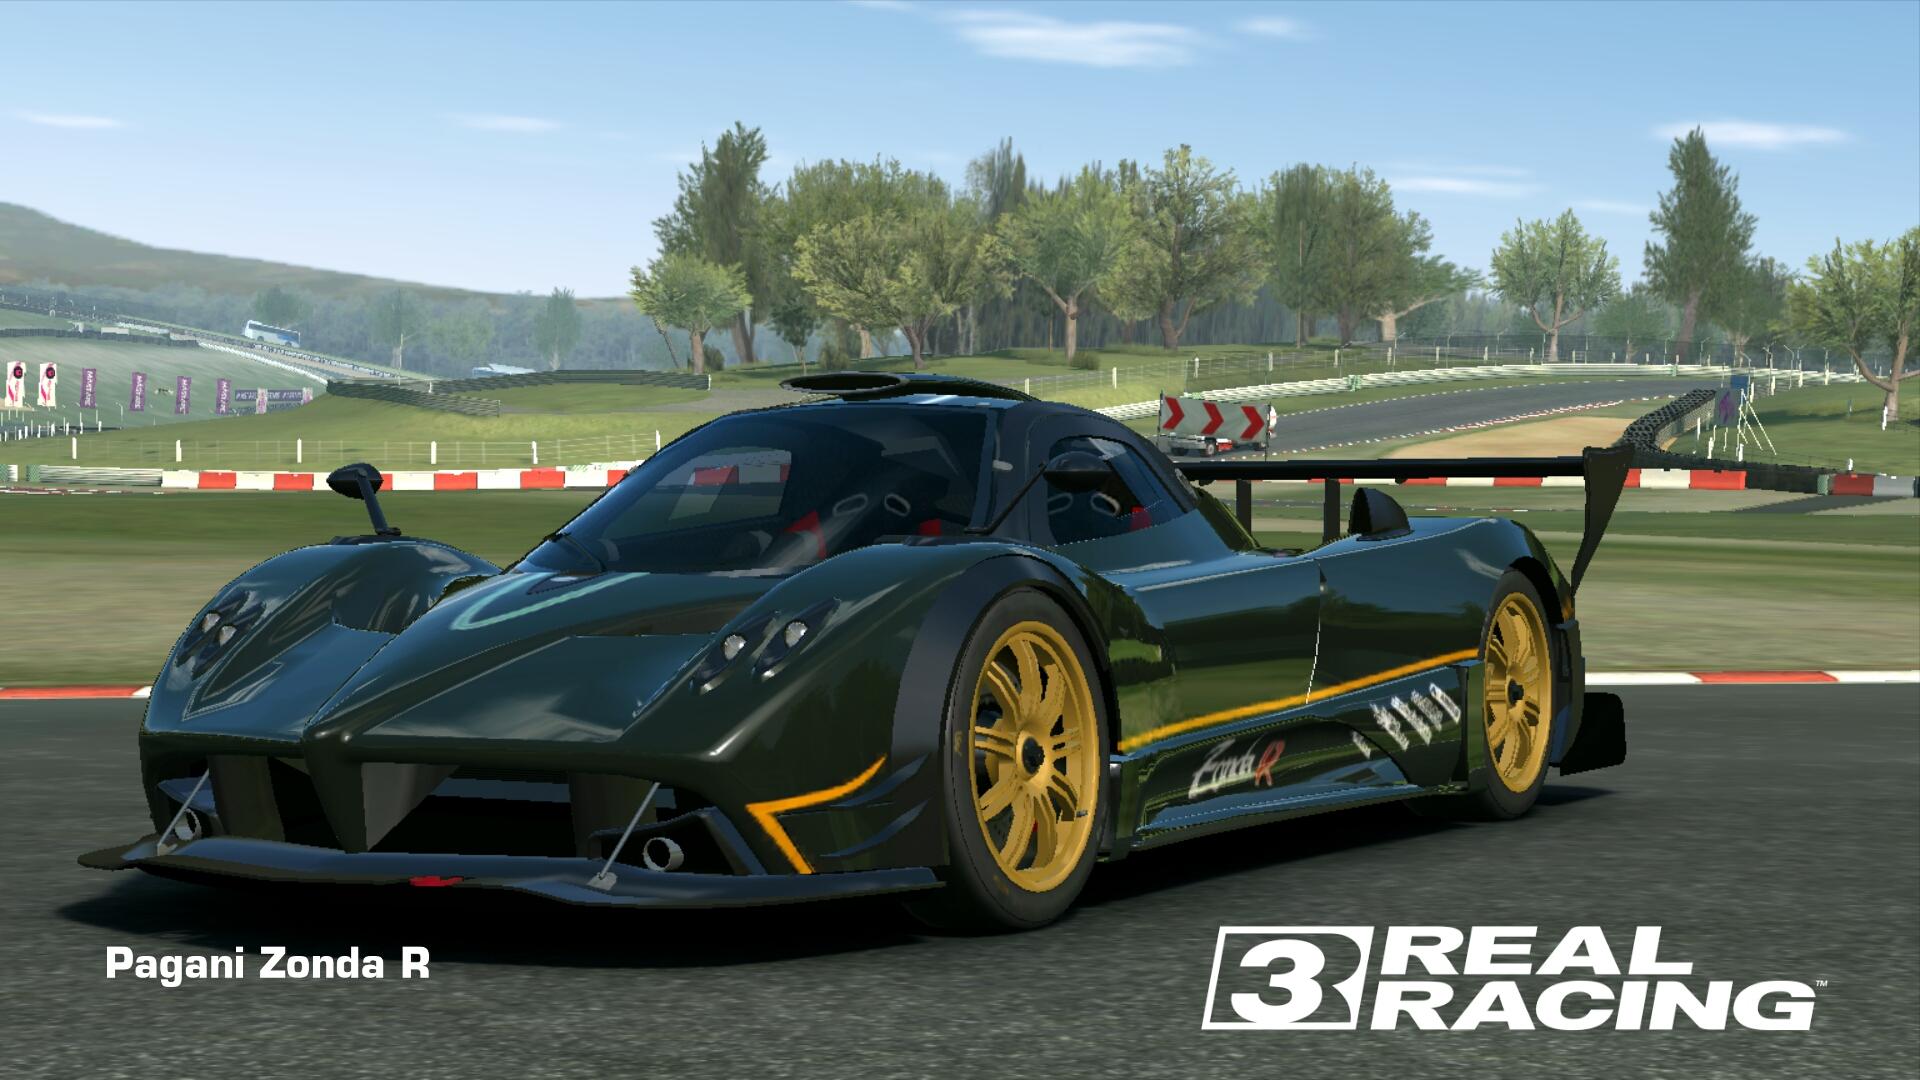 Pagani Zonda R | Real Racing 3 Wiki | FANDOM powered by Wikia